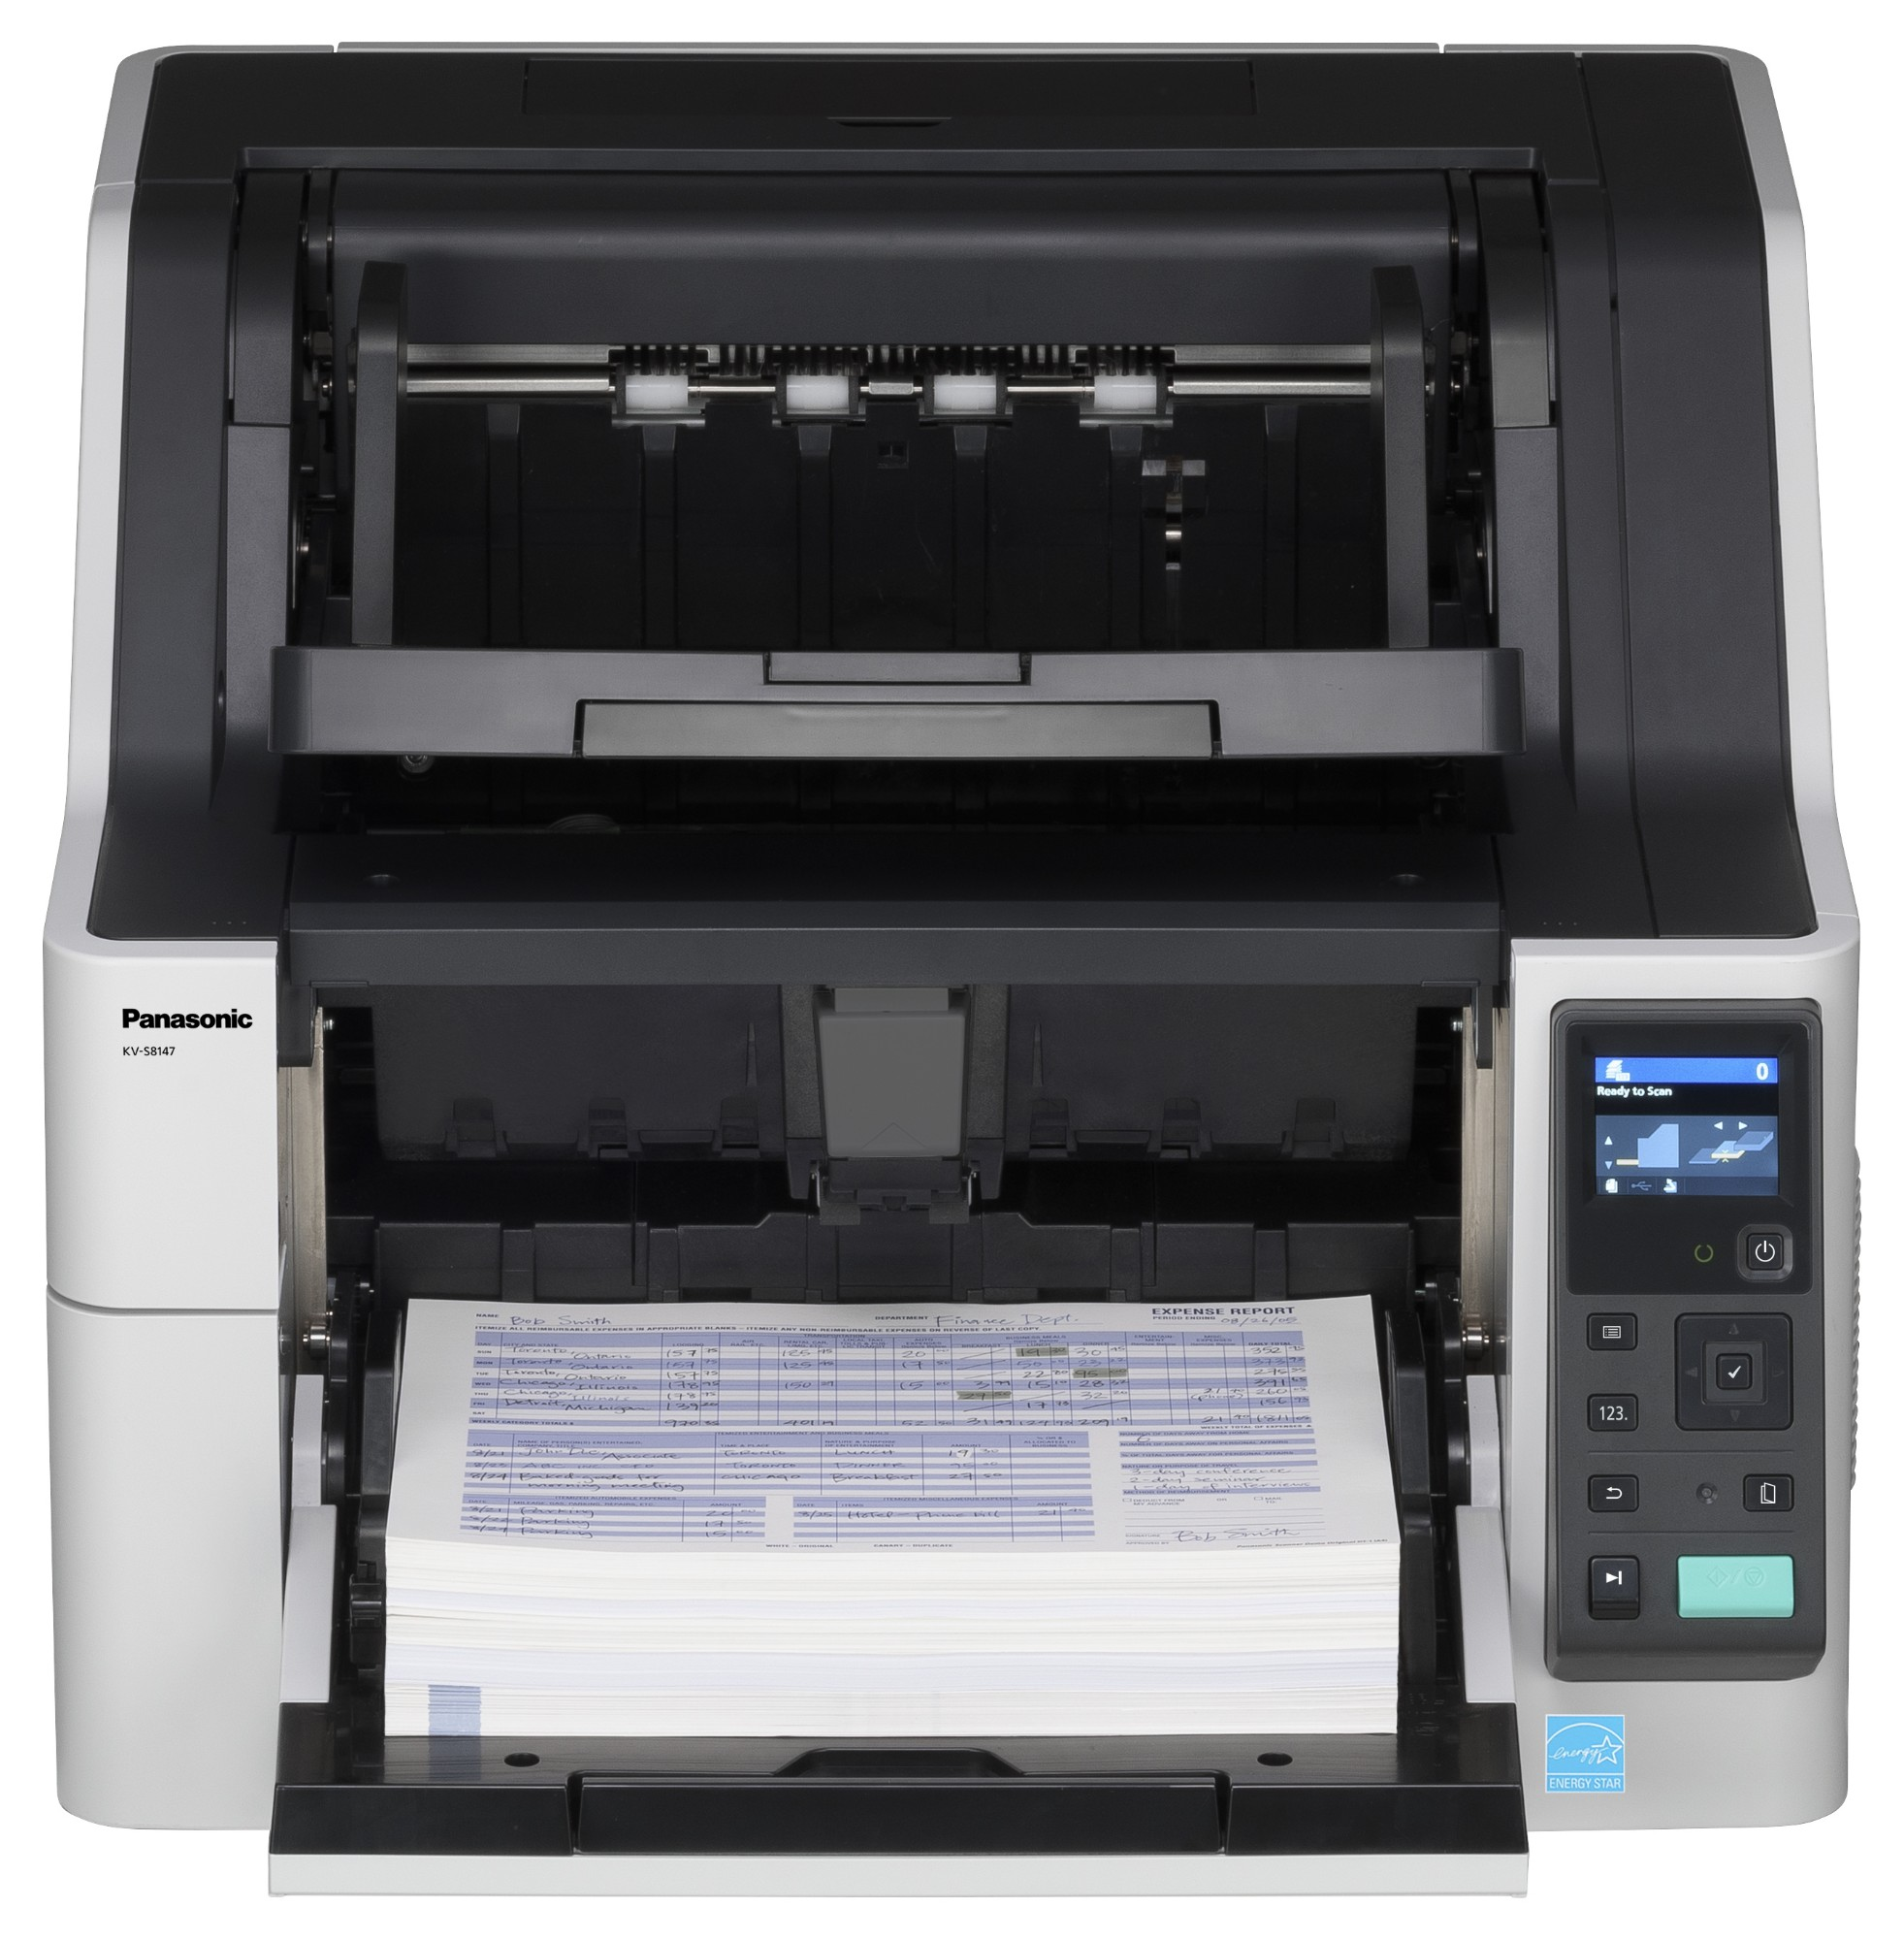 Panasonic KV-S8147 600 x 1200 DPI ADF scanner Black,White A3